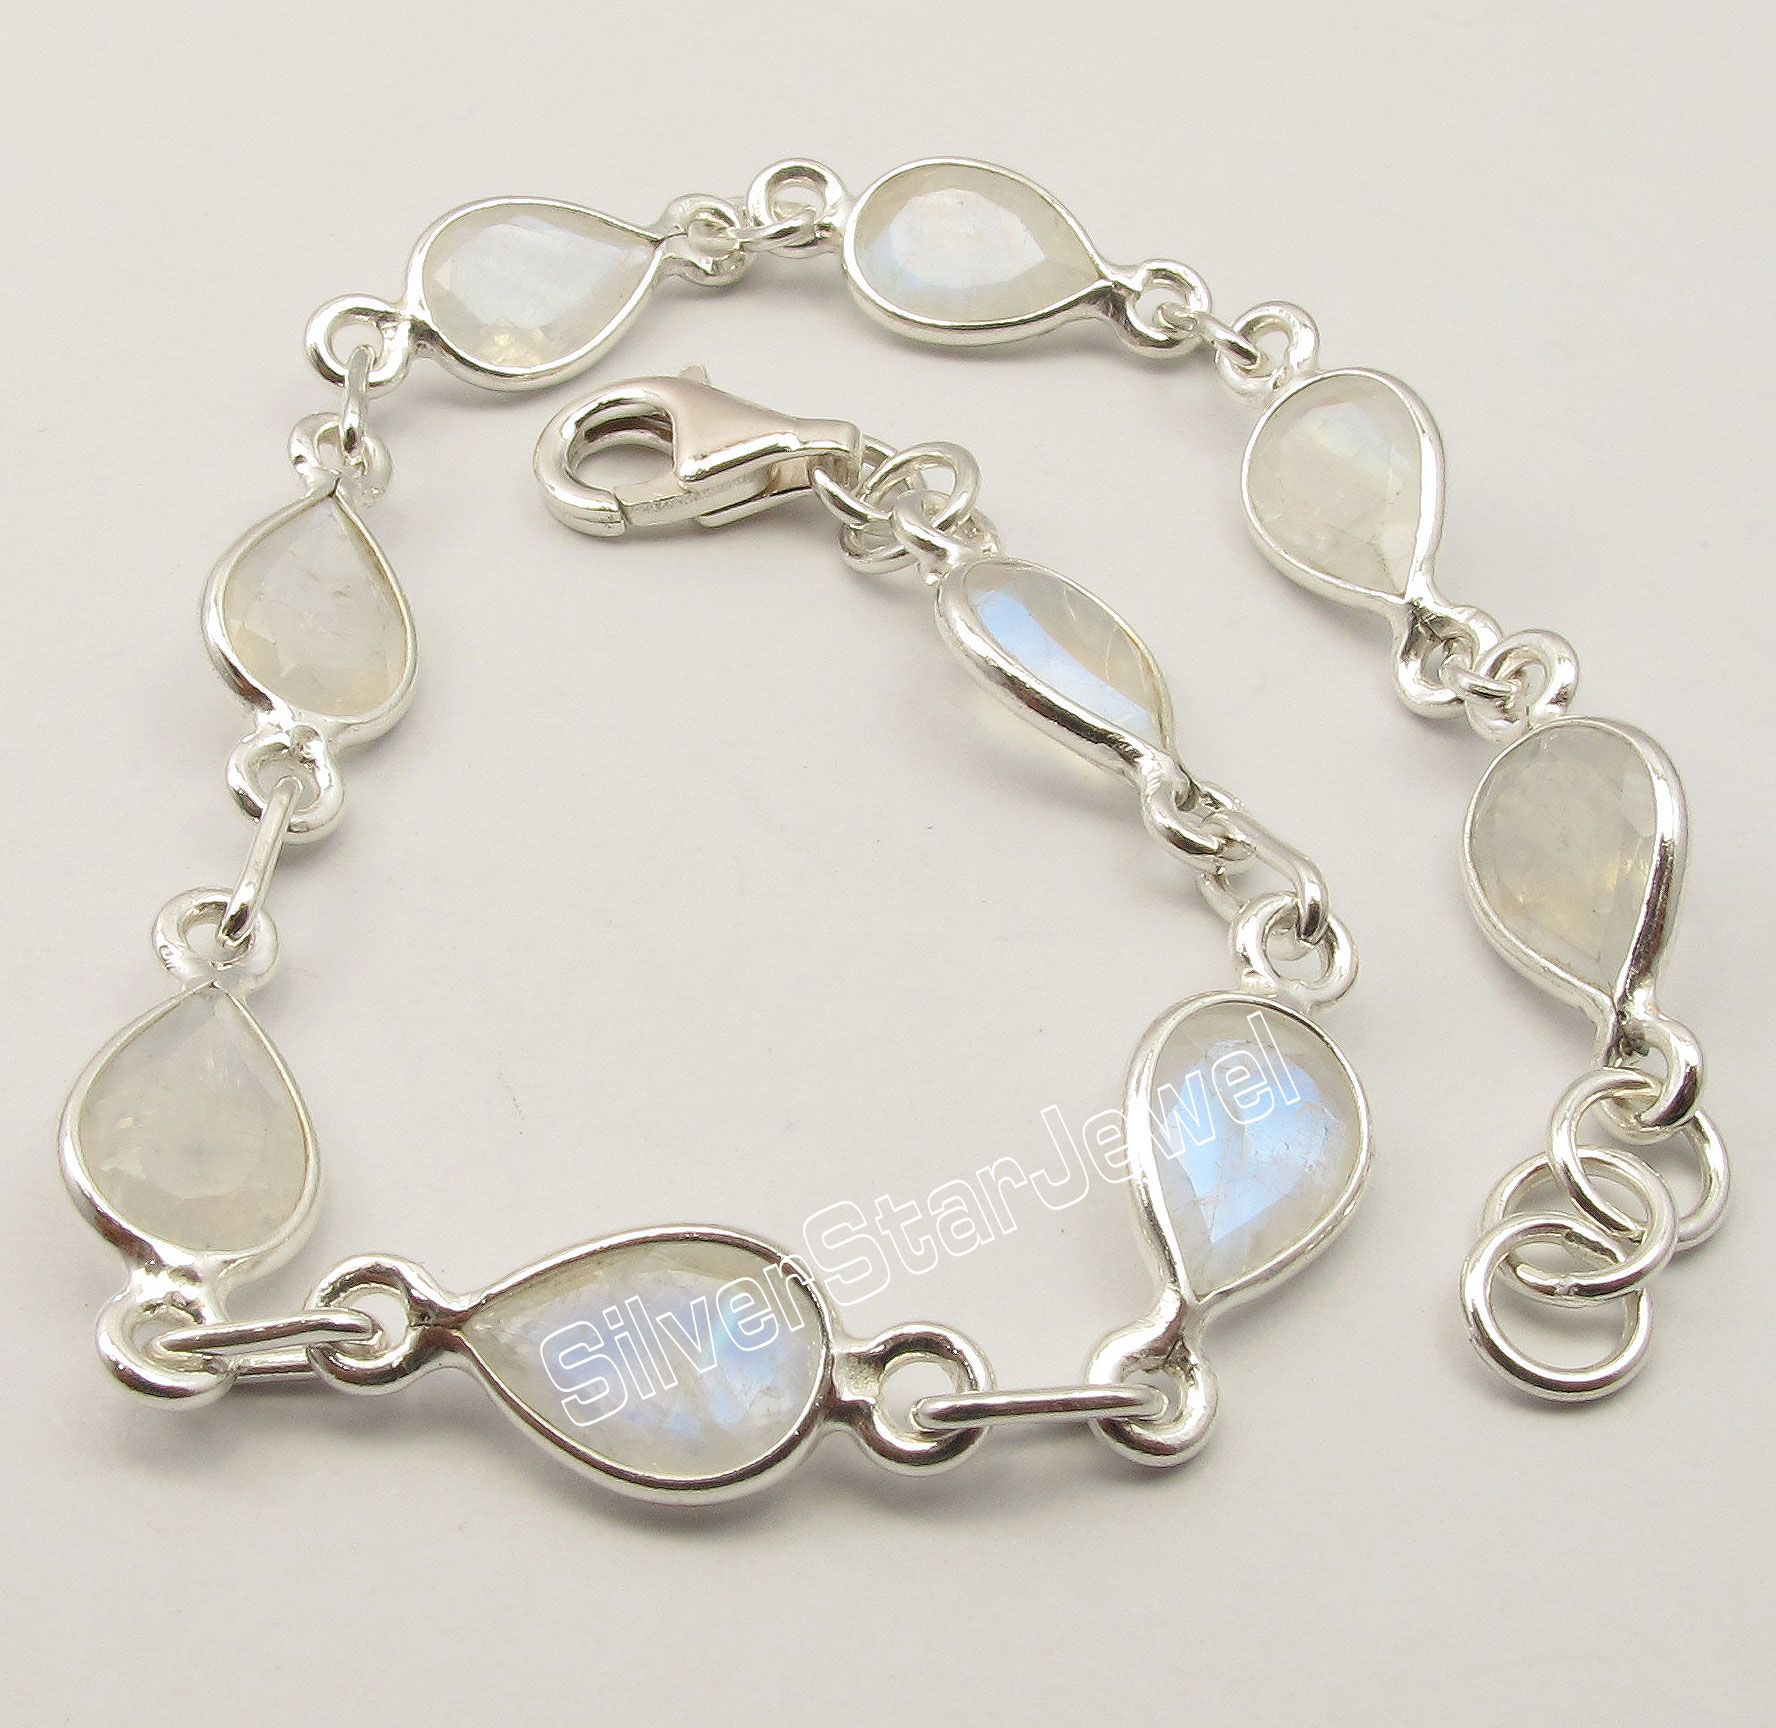 Chanti International . Silver BLUE FIRE DROP RAINBOW MOONSTONE ART Bracelet 8 3/8 Inches